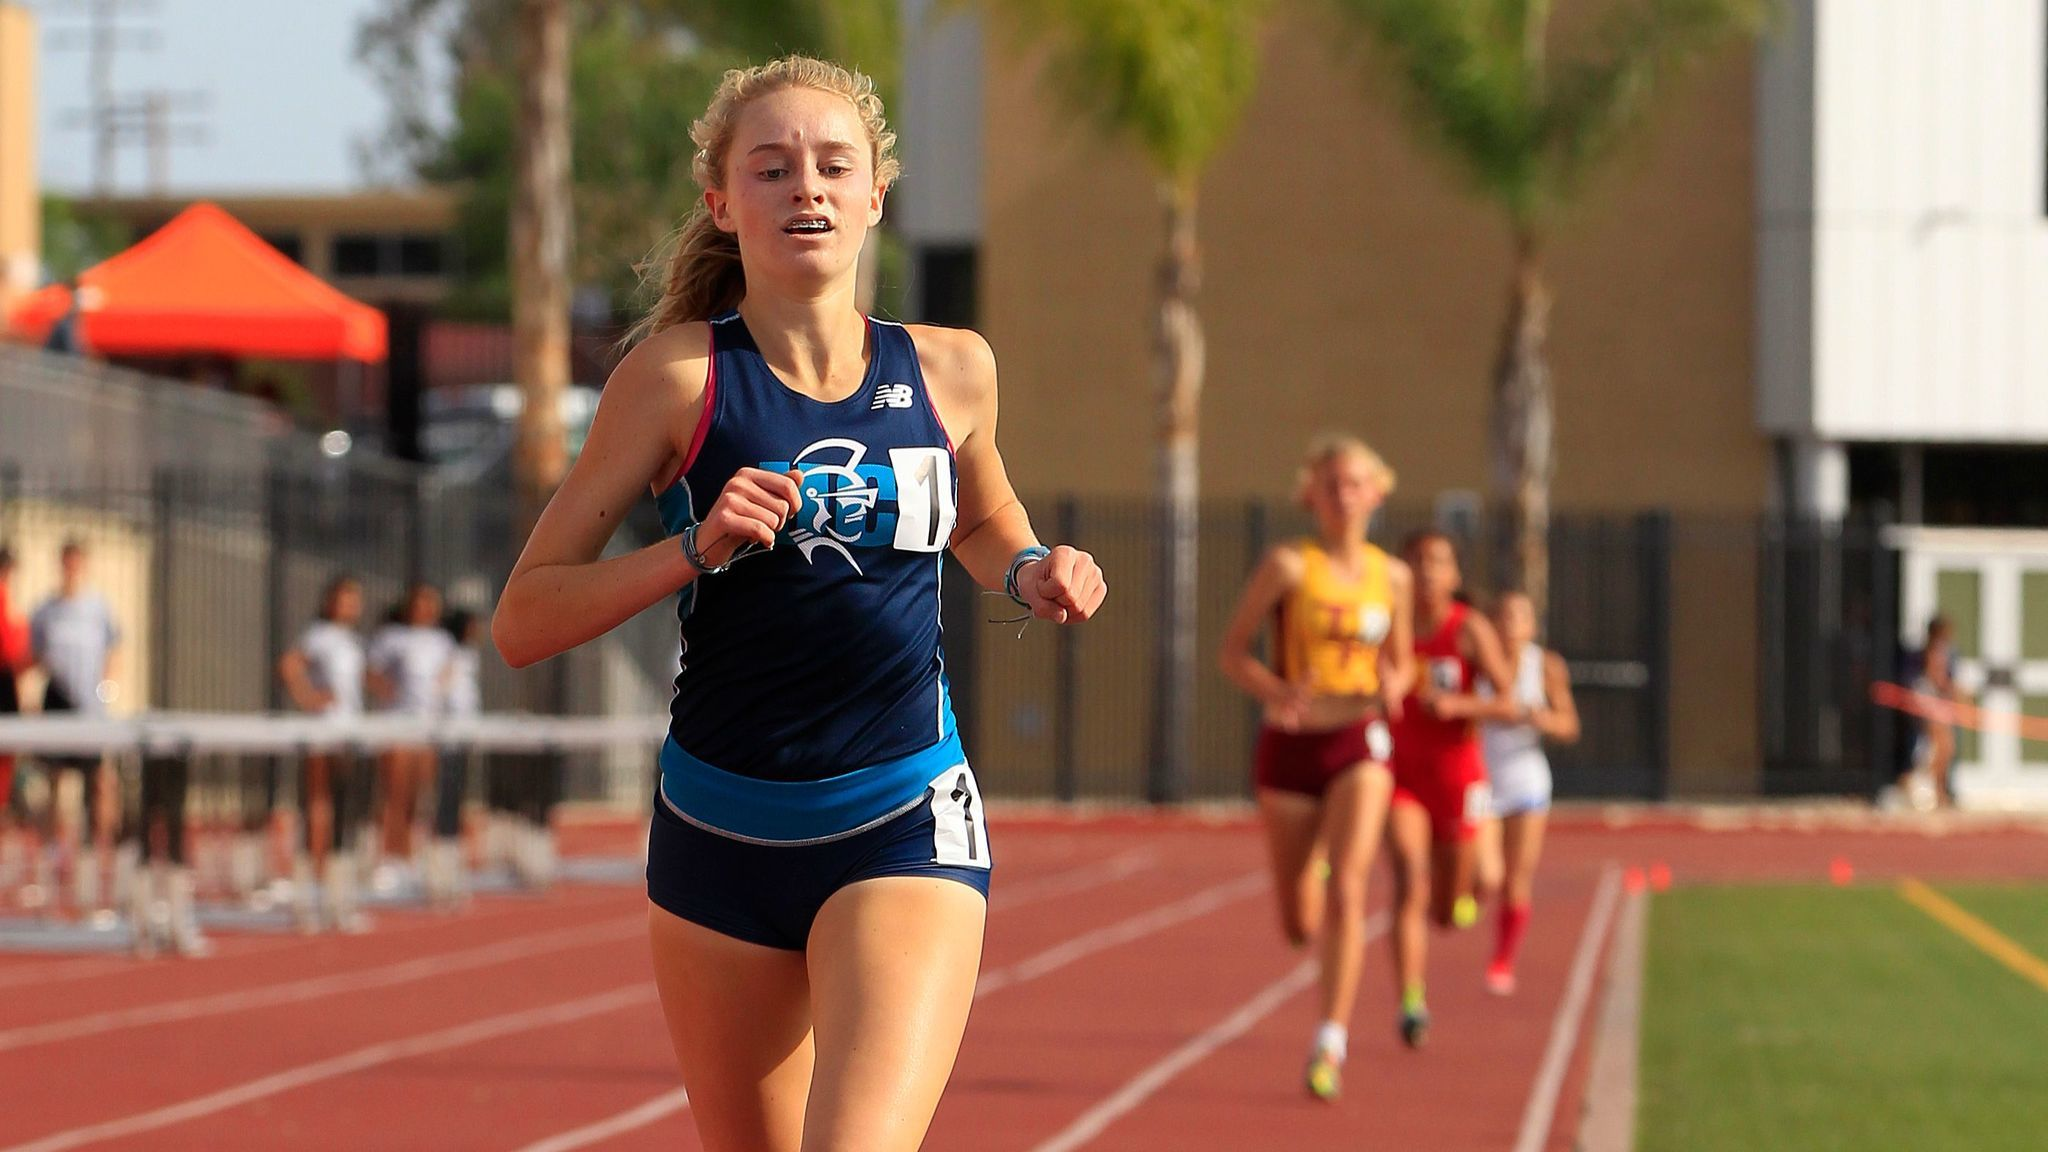 Elise Boisvert of University City won the girls 1,600 meters in 5:04.42, just off her lifetime best of 5:03.72.